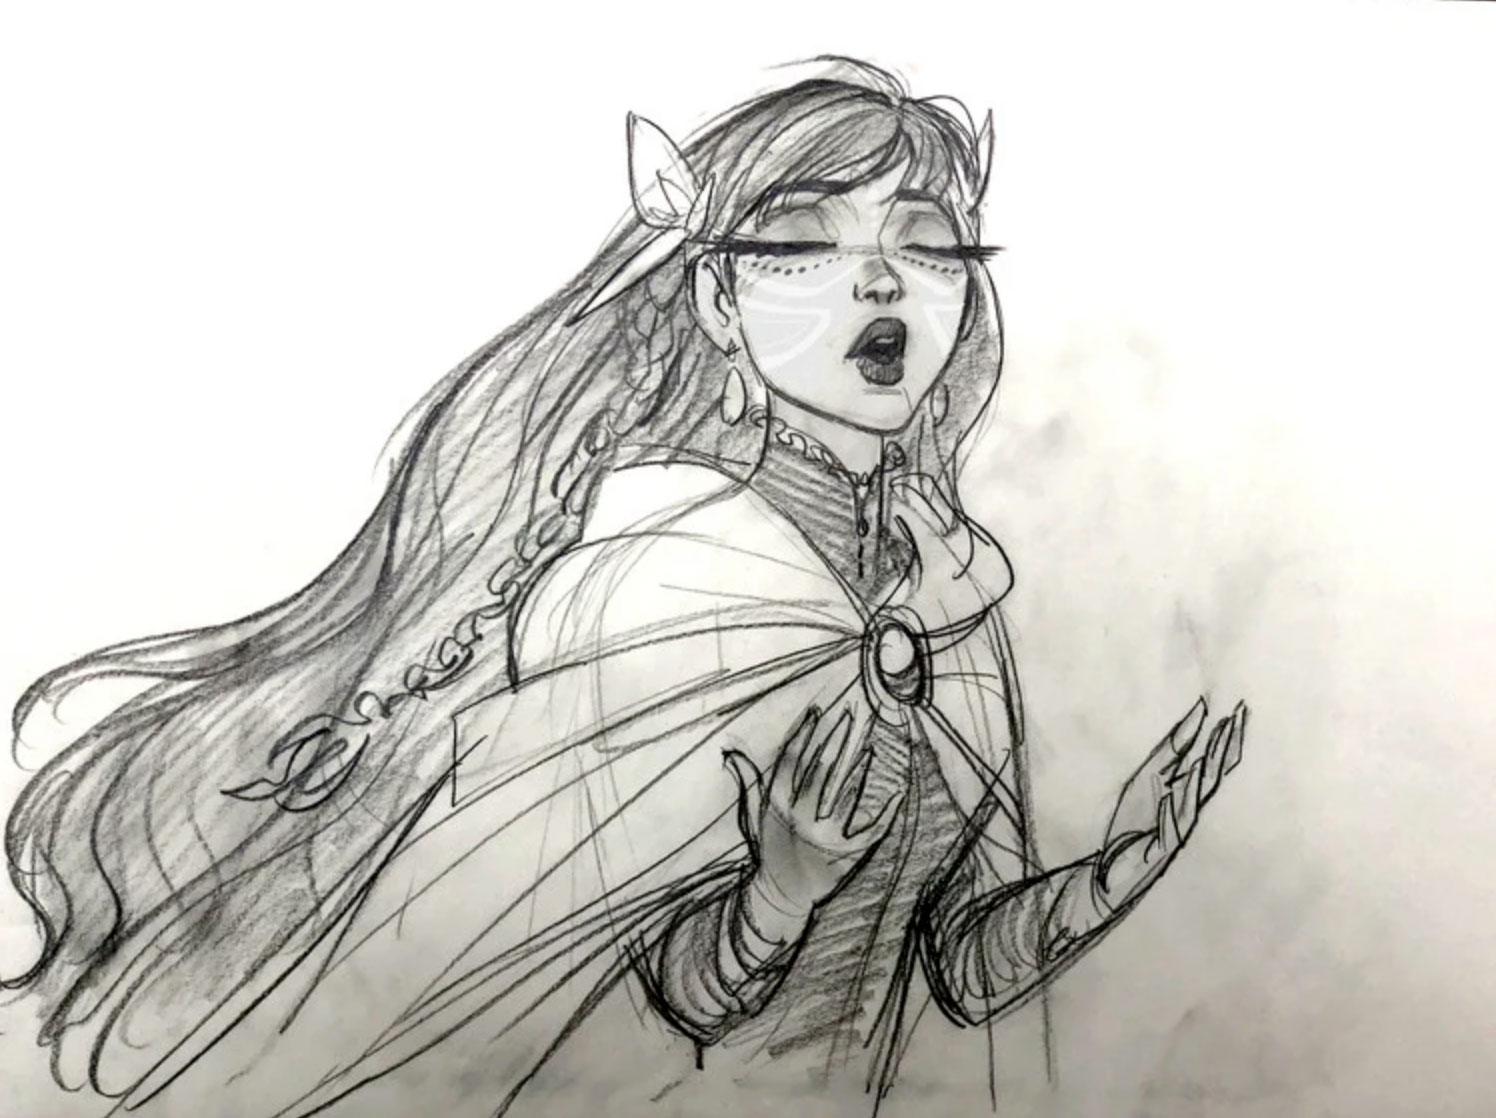 Concept artwork for Belle by Jin Kim